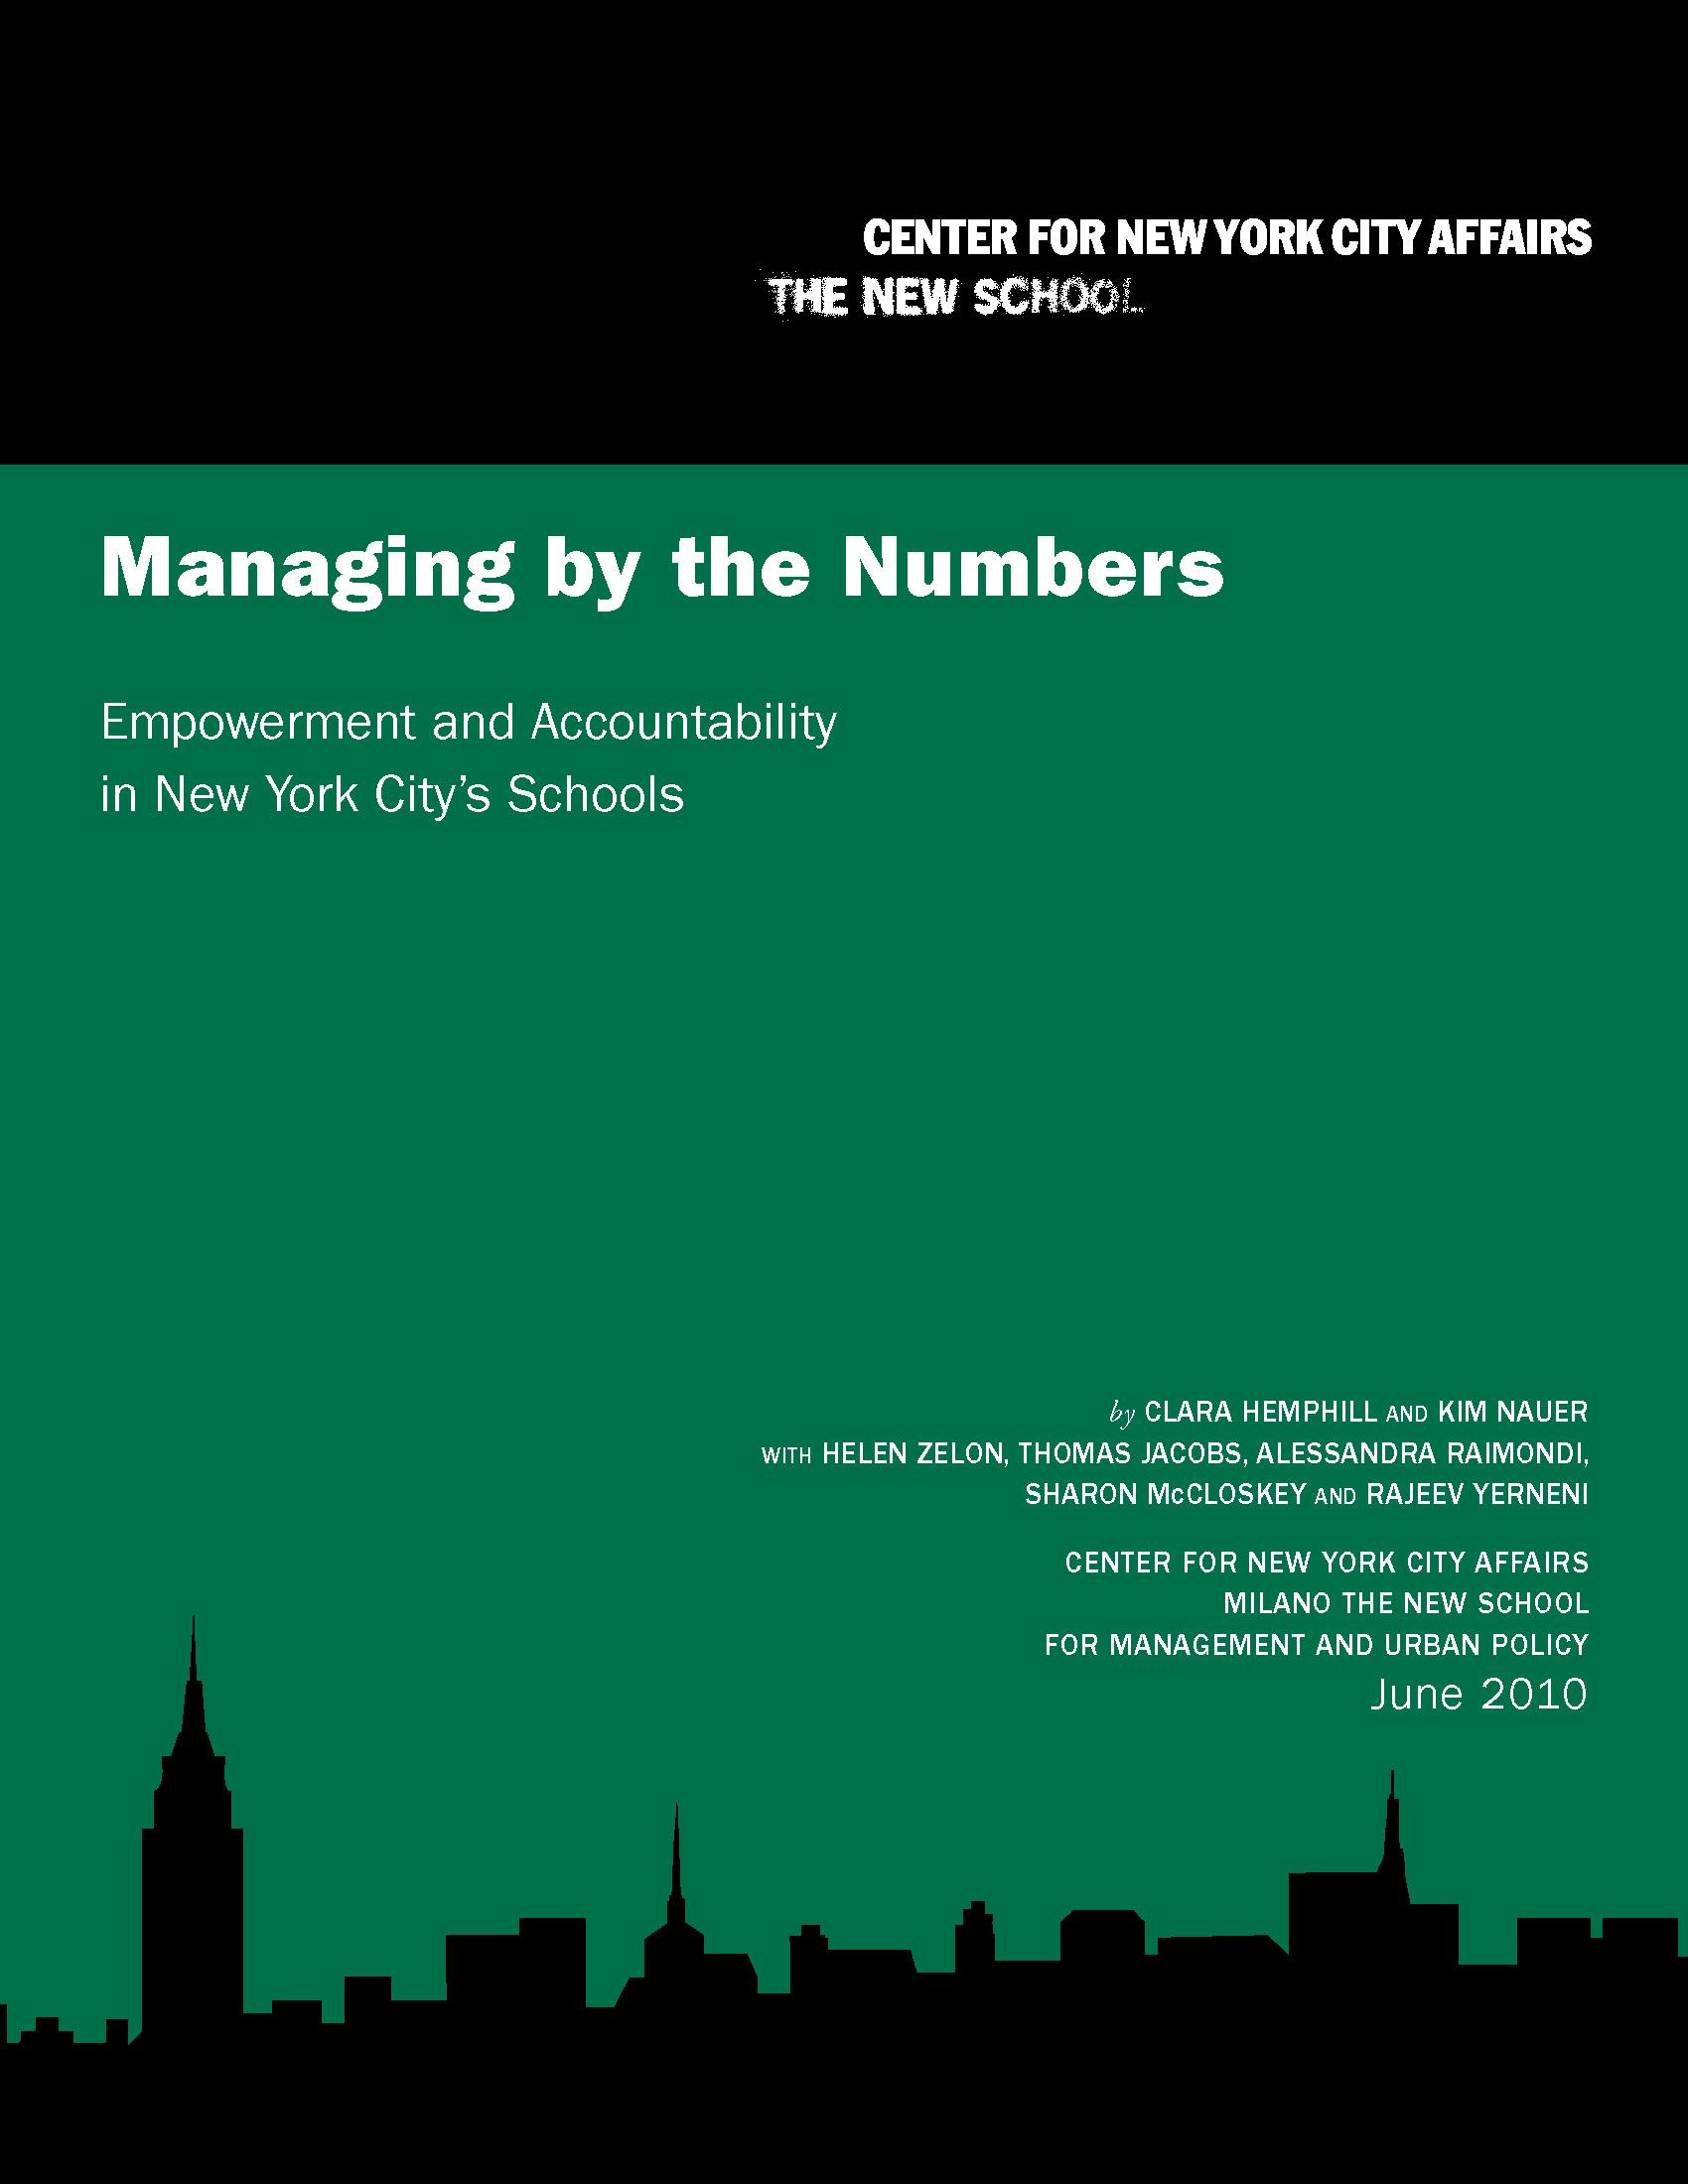 Pages from ManagingByTheNumbers_EmpowermentandAccountabilityinNYCSchools.jpg